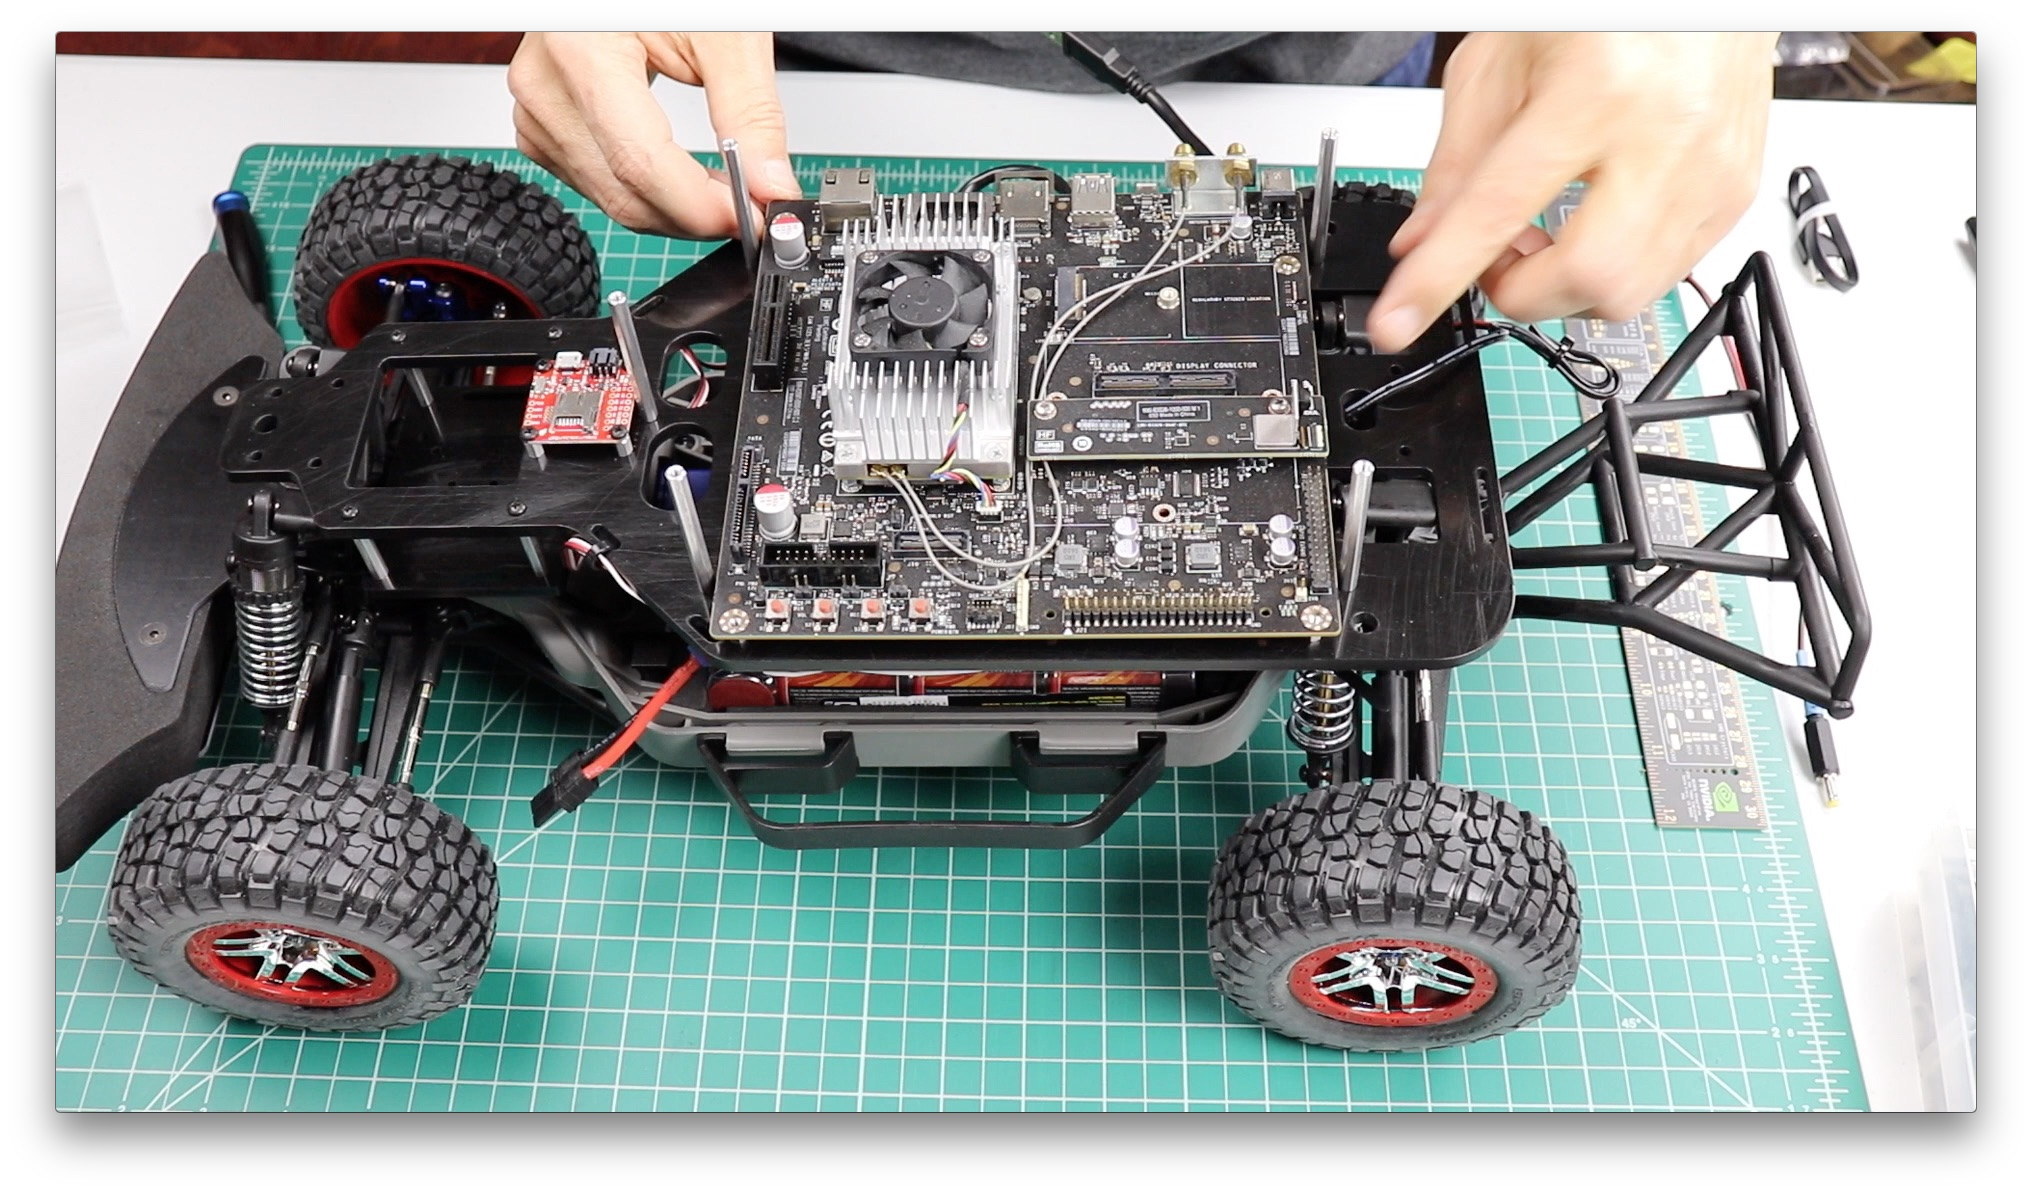 Jetson Dev Kit Installation